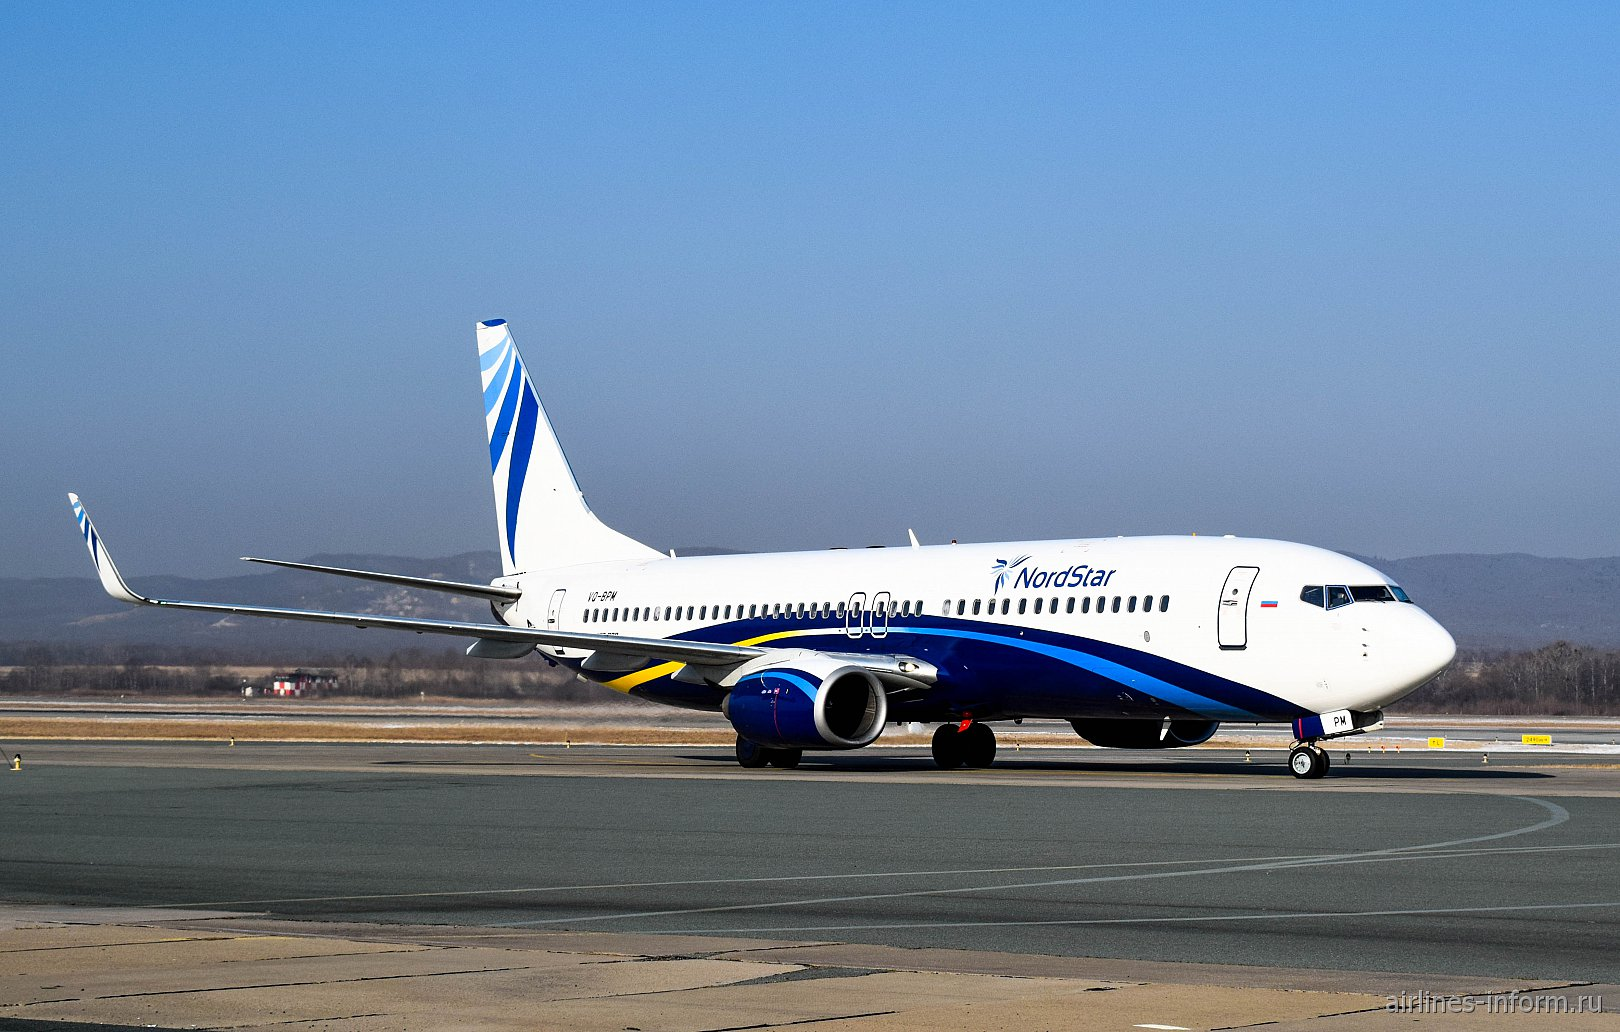 Самолет Боинг-737-800 VQ-BPM авиакомпании NordStar в аэропорту Владивостока